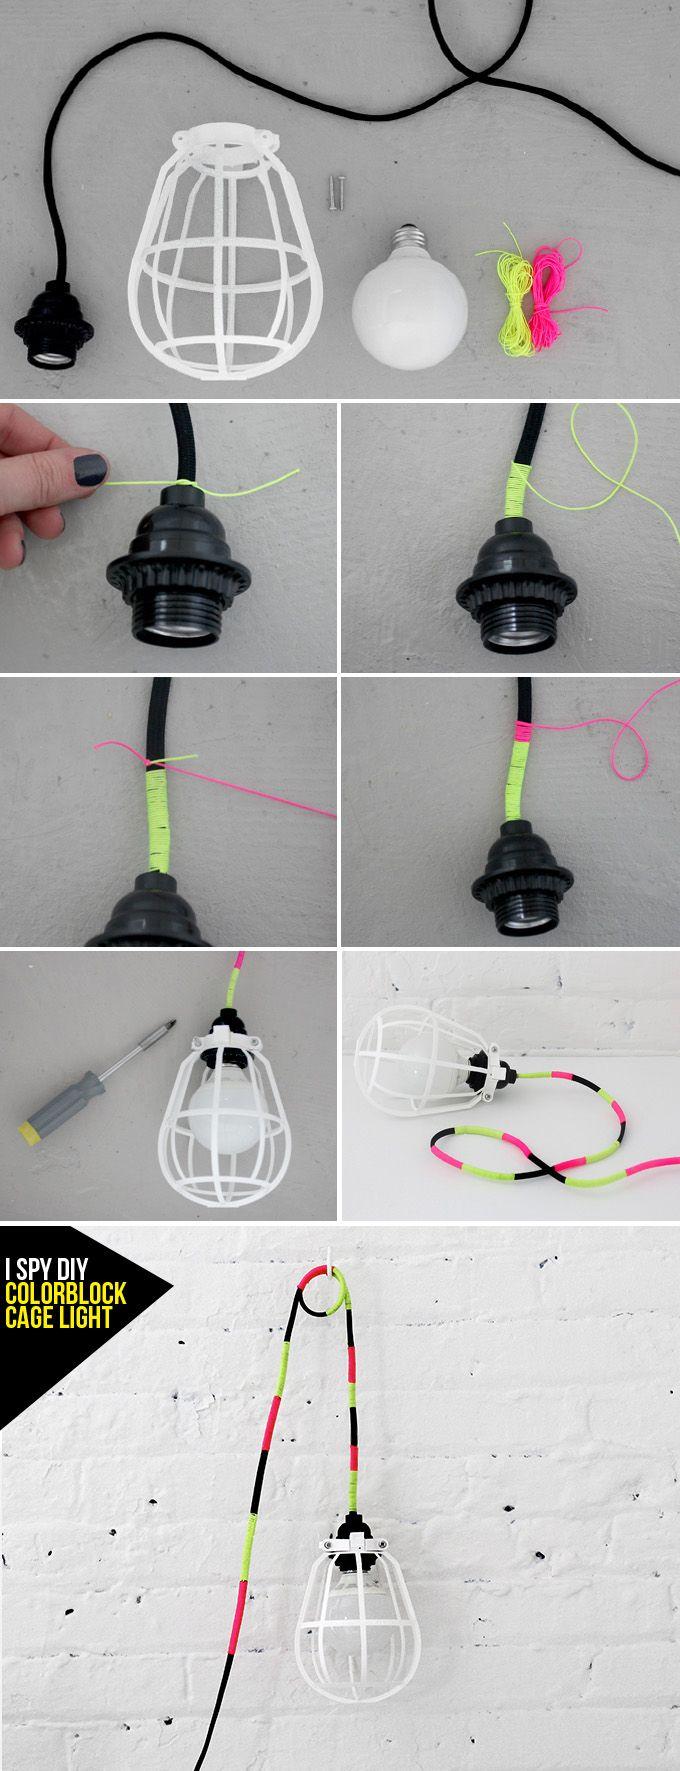 MY DIY | Colorblock Cage Light | I SPY DIY